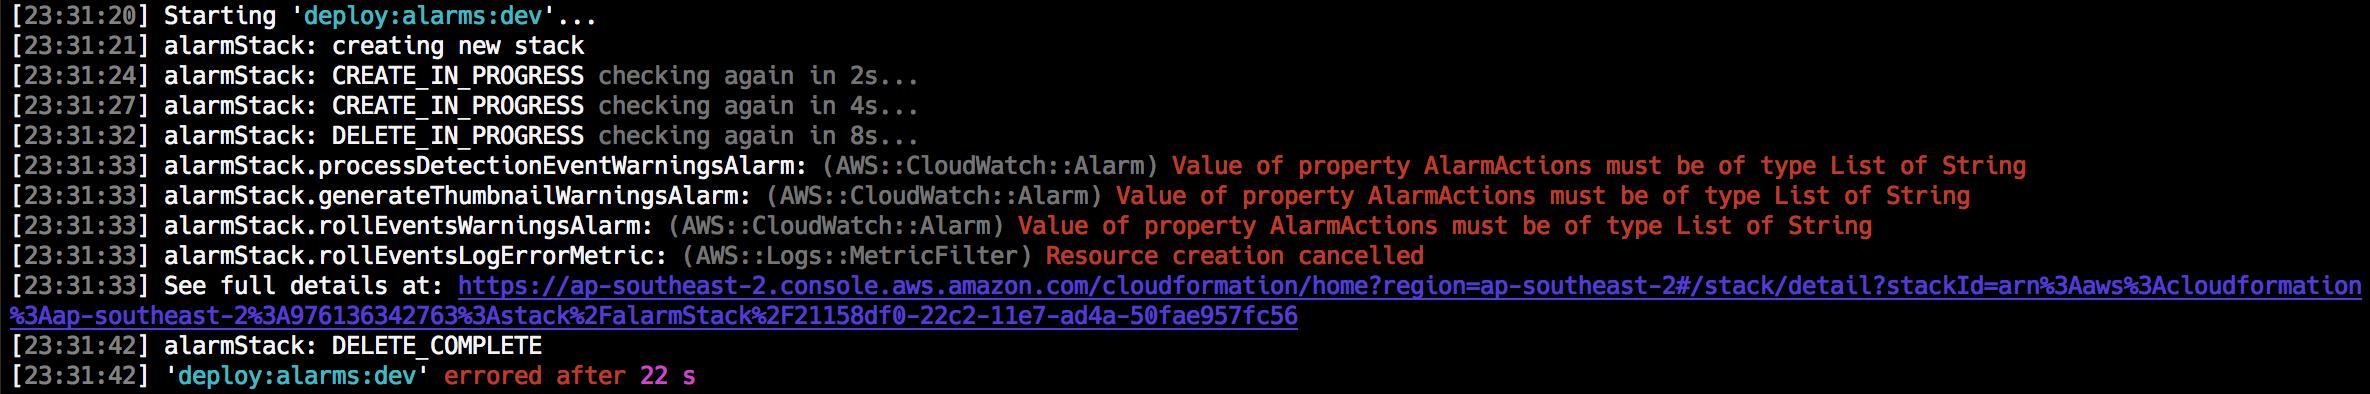 Example console error output